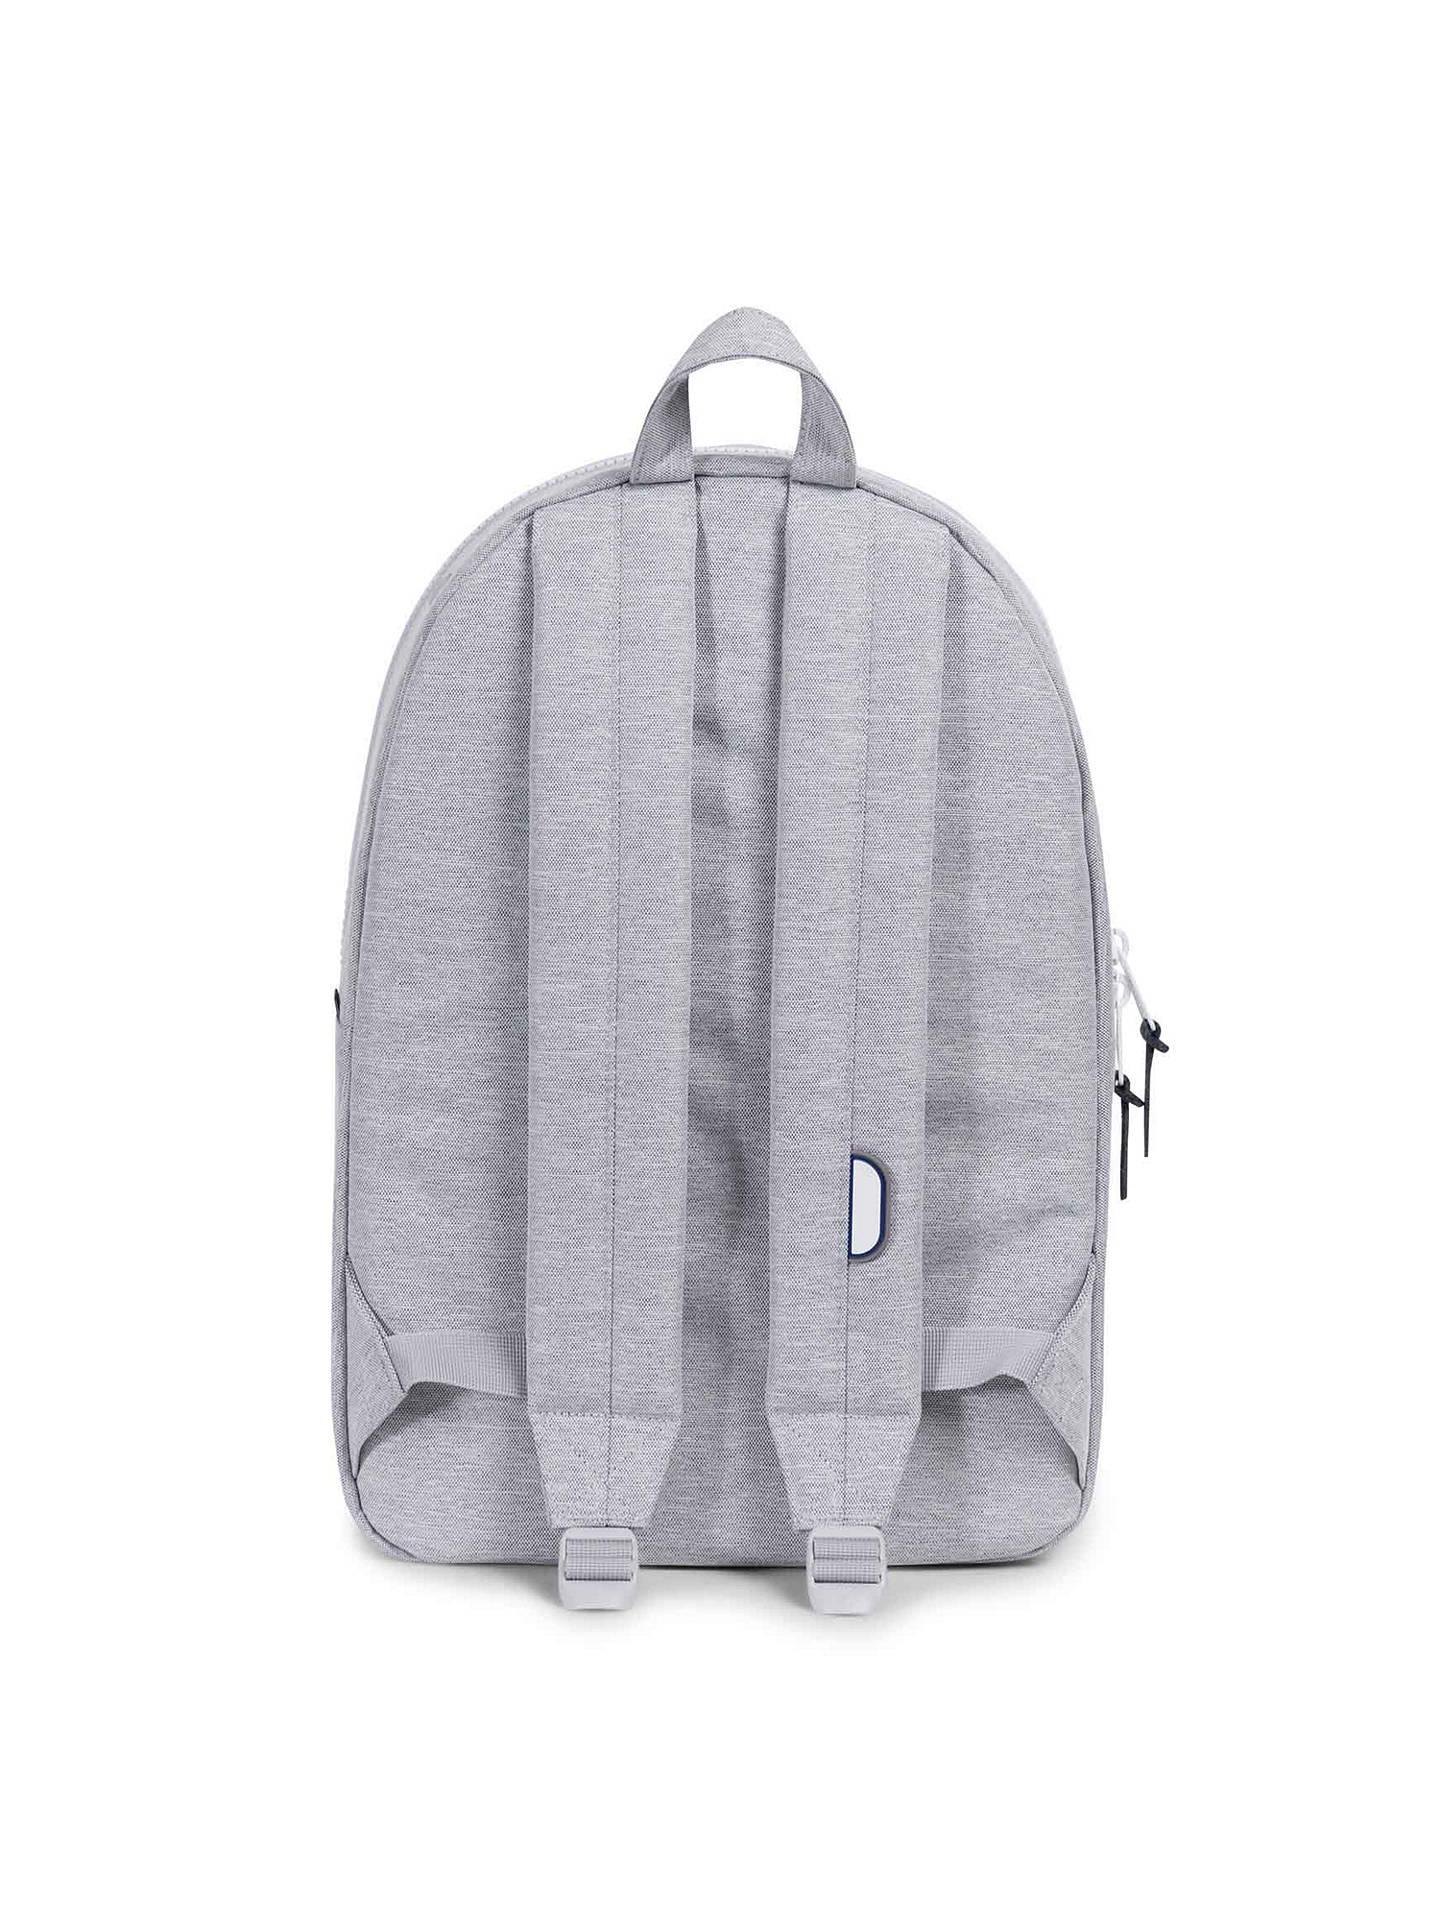 a6bfea1def2 ... BuyHerschel Supply Co. Settlement Backpack, Light Grey Online at  johnlewis.com